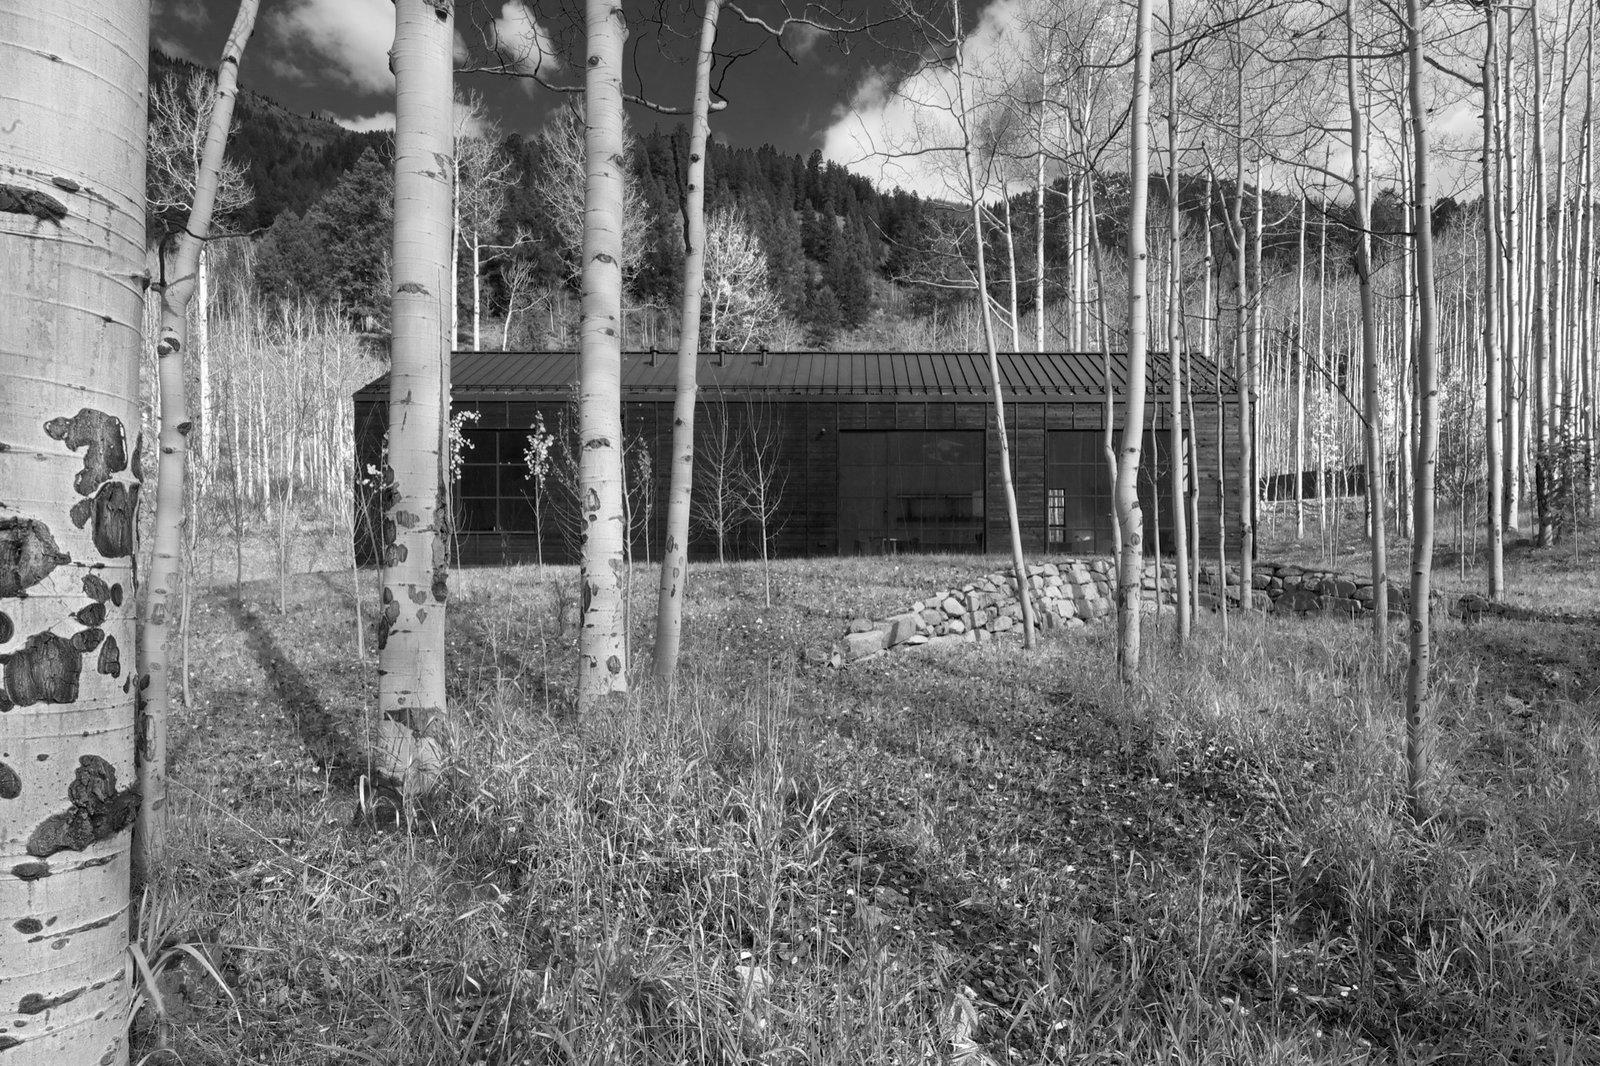 Retreat in the Aspen Grove - Photo 1 of 13